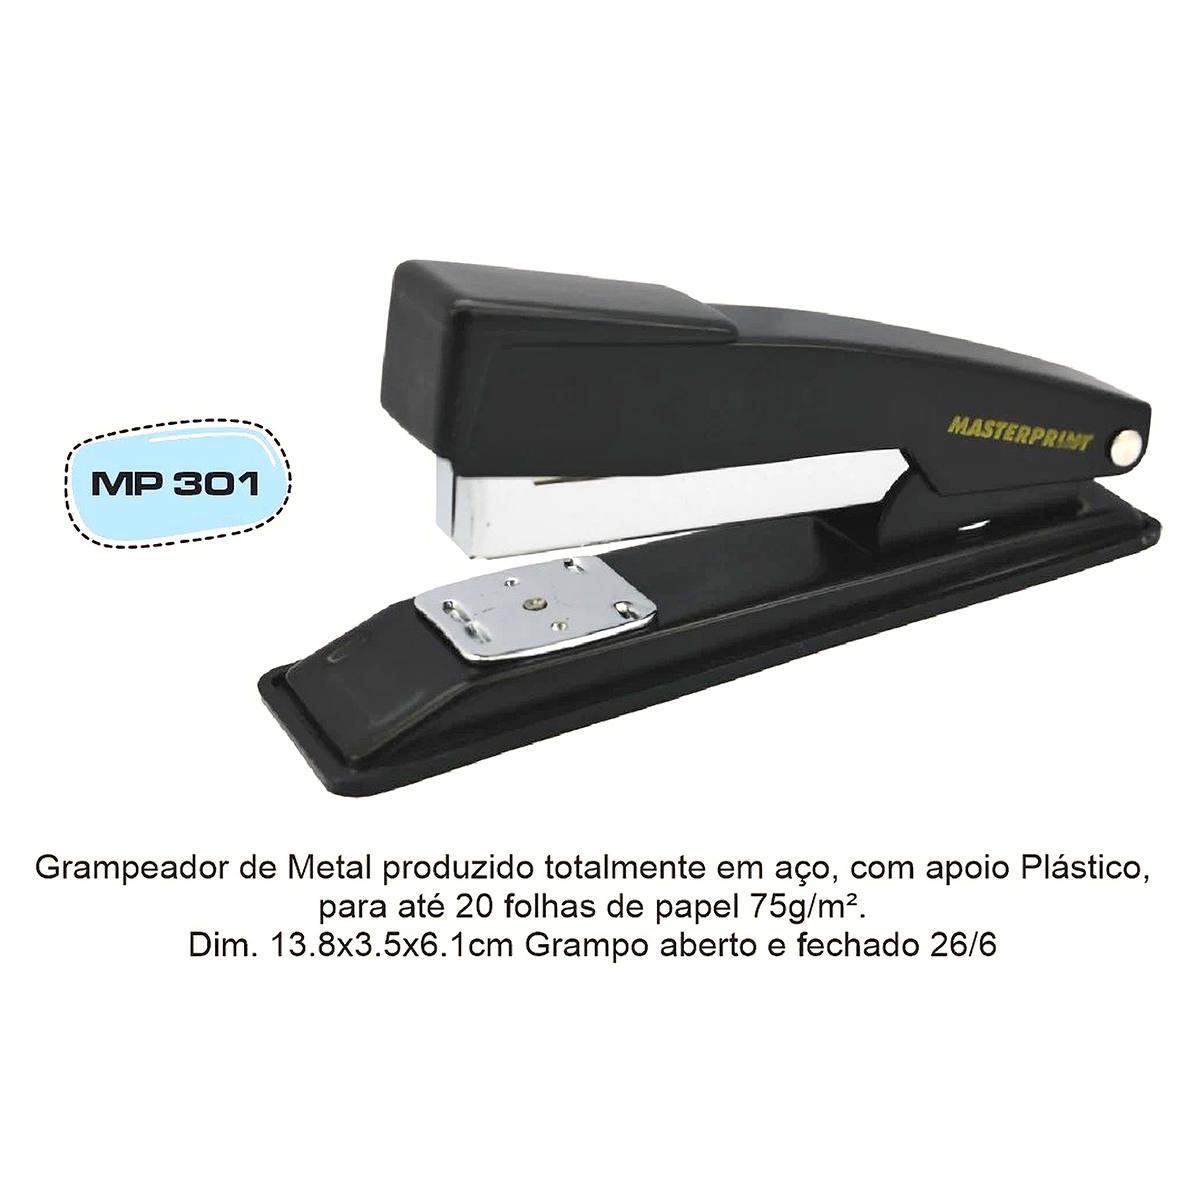 Grampeador de Mesa Metálico 13,5cm Grampos 26/6 para até 20 Folhas Masterprint MP301